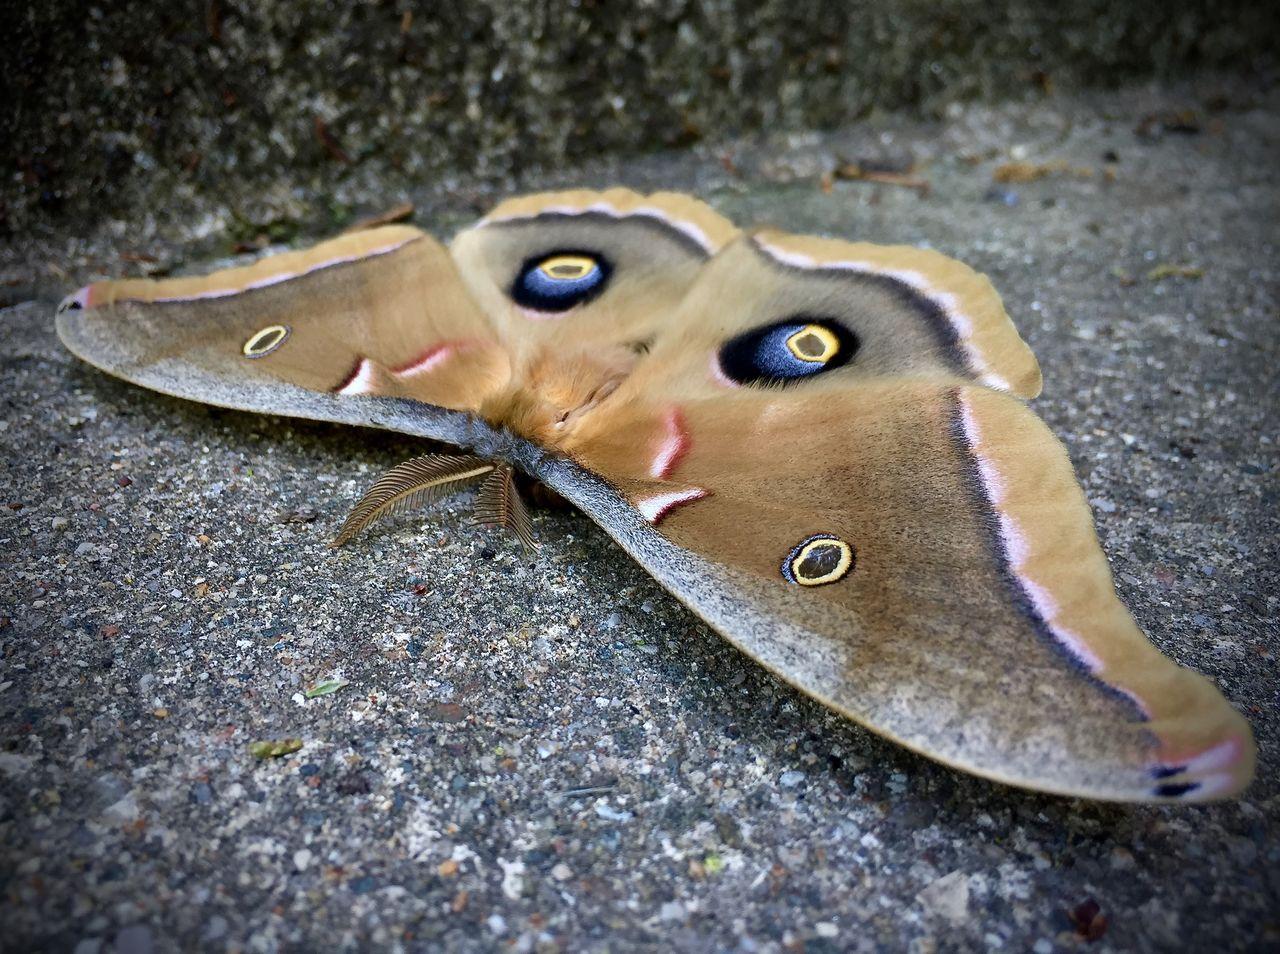 Close-up of giant silk moth on asphalt